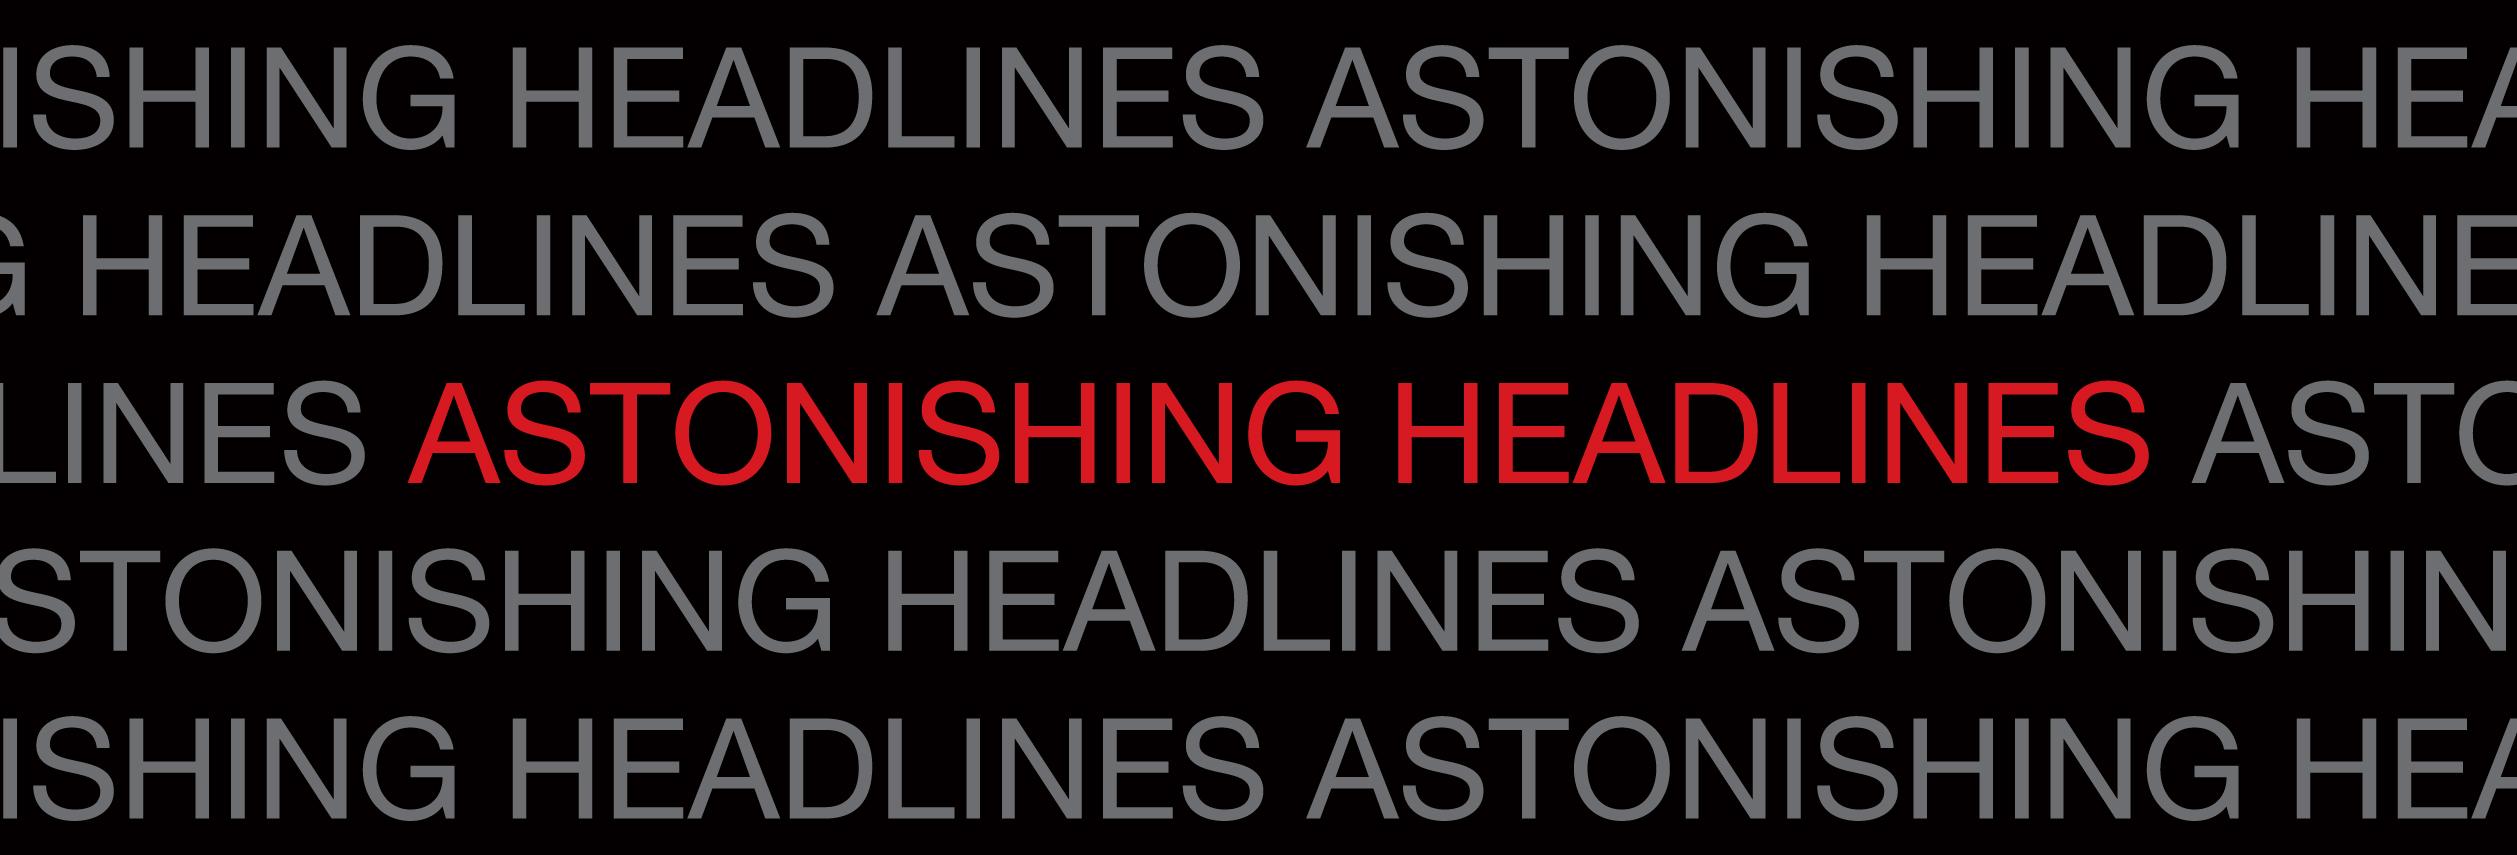 astonishingheadlines-logo.jpg